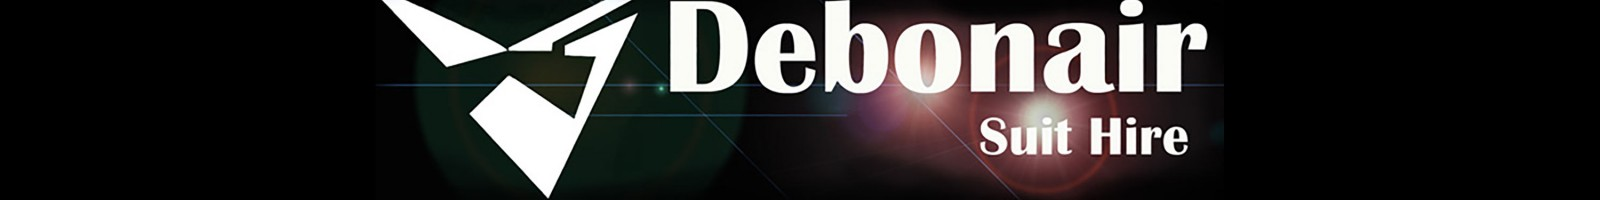 Debonair Suit Hire and Retail